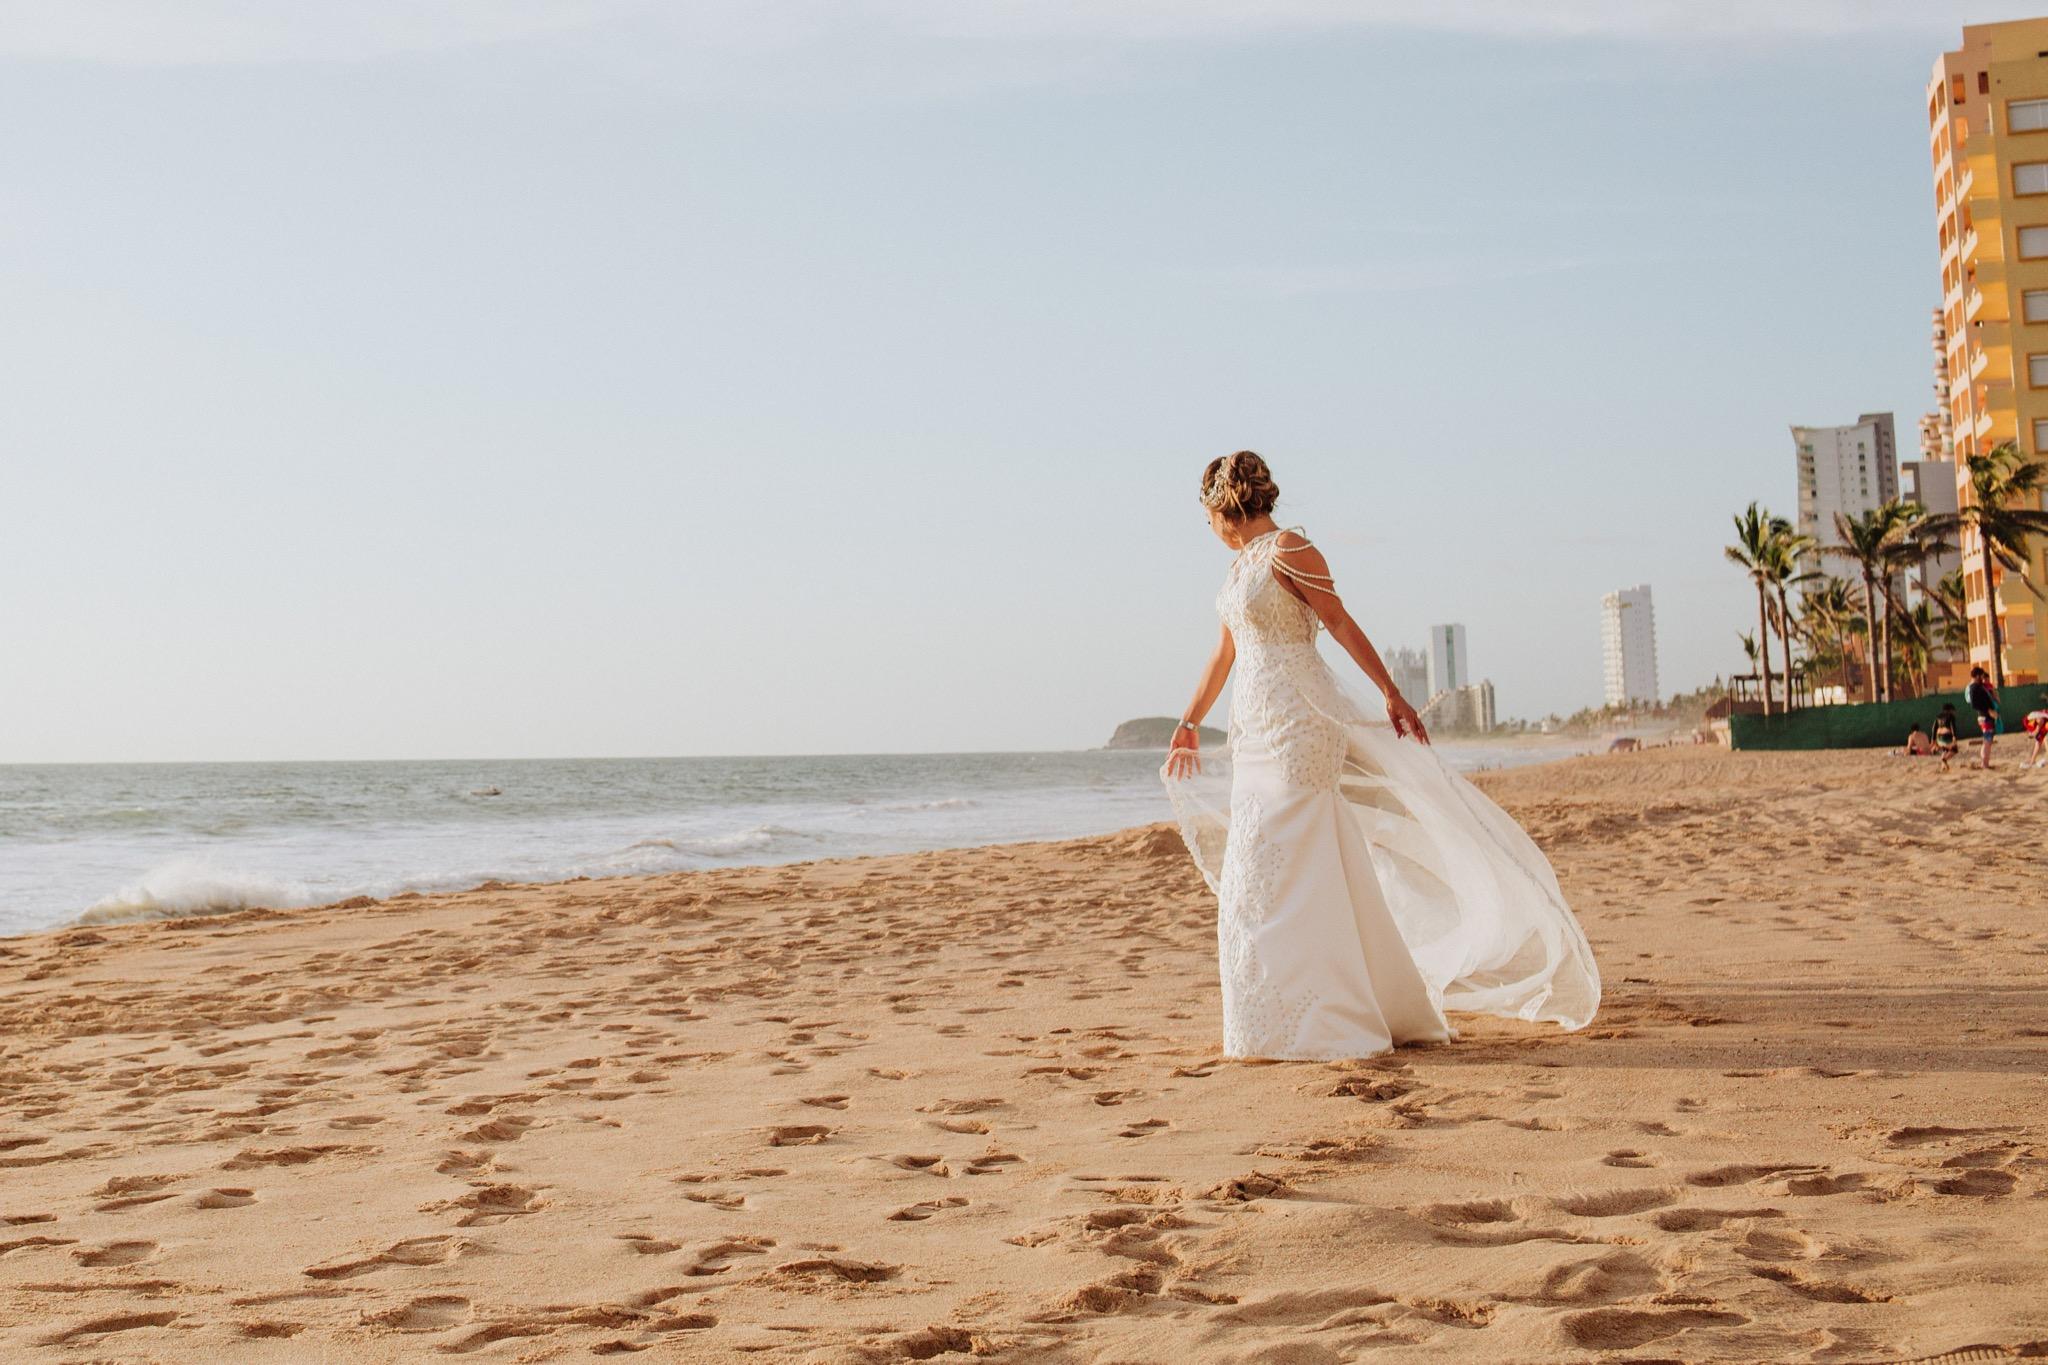 Javier_noriega_fotografo_bodas_profesional_zacatecas_mexico_mazatlan_sinaloa_photographer_weddings47